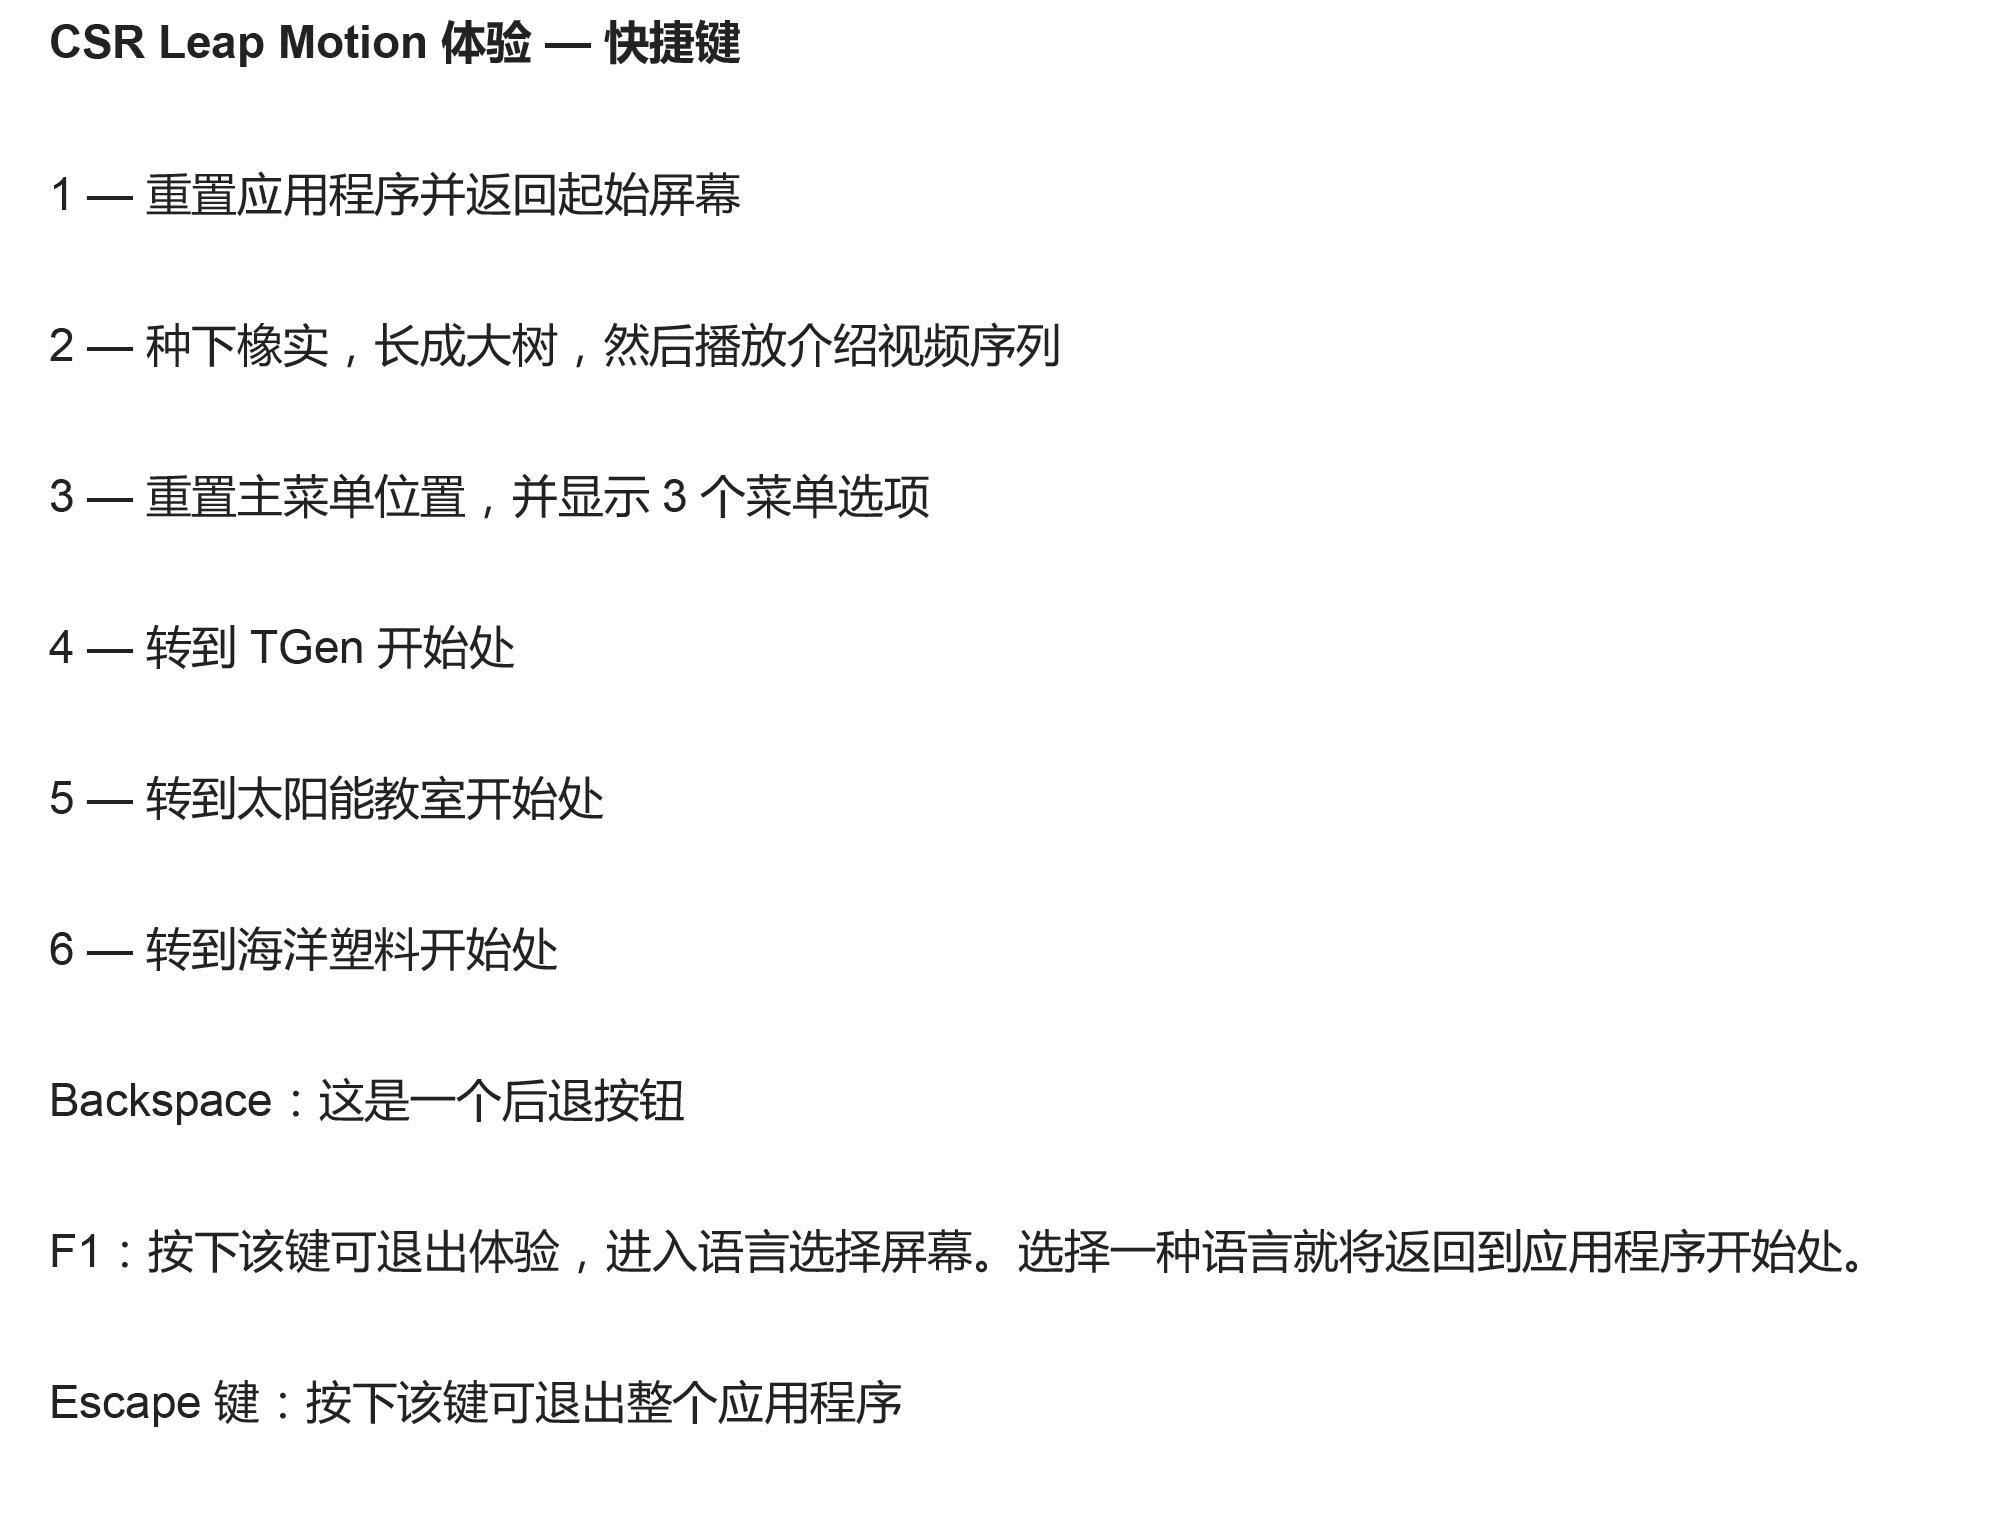 CSR Leap Motion - Hot Keys - Chinese.jpg